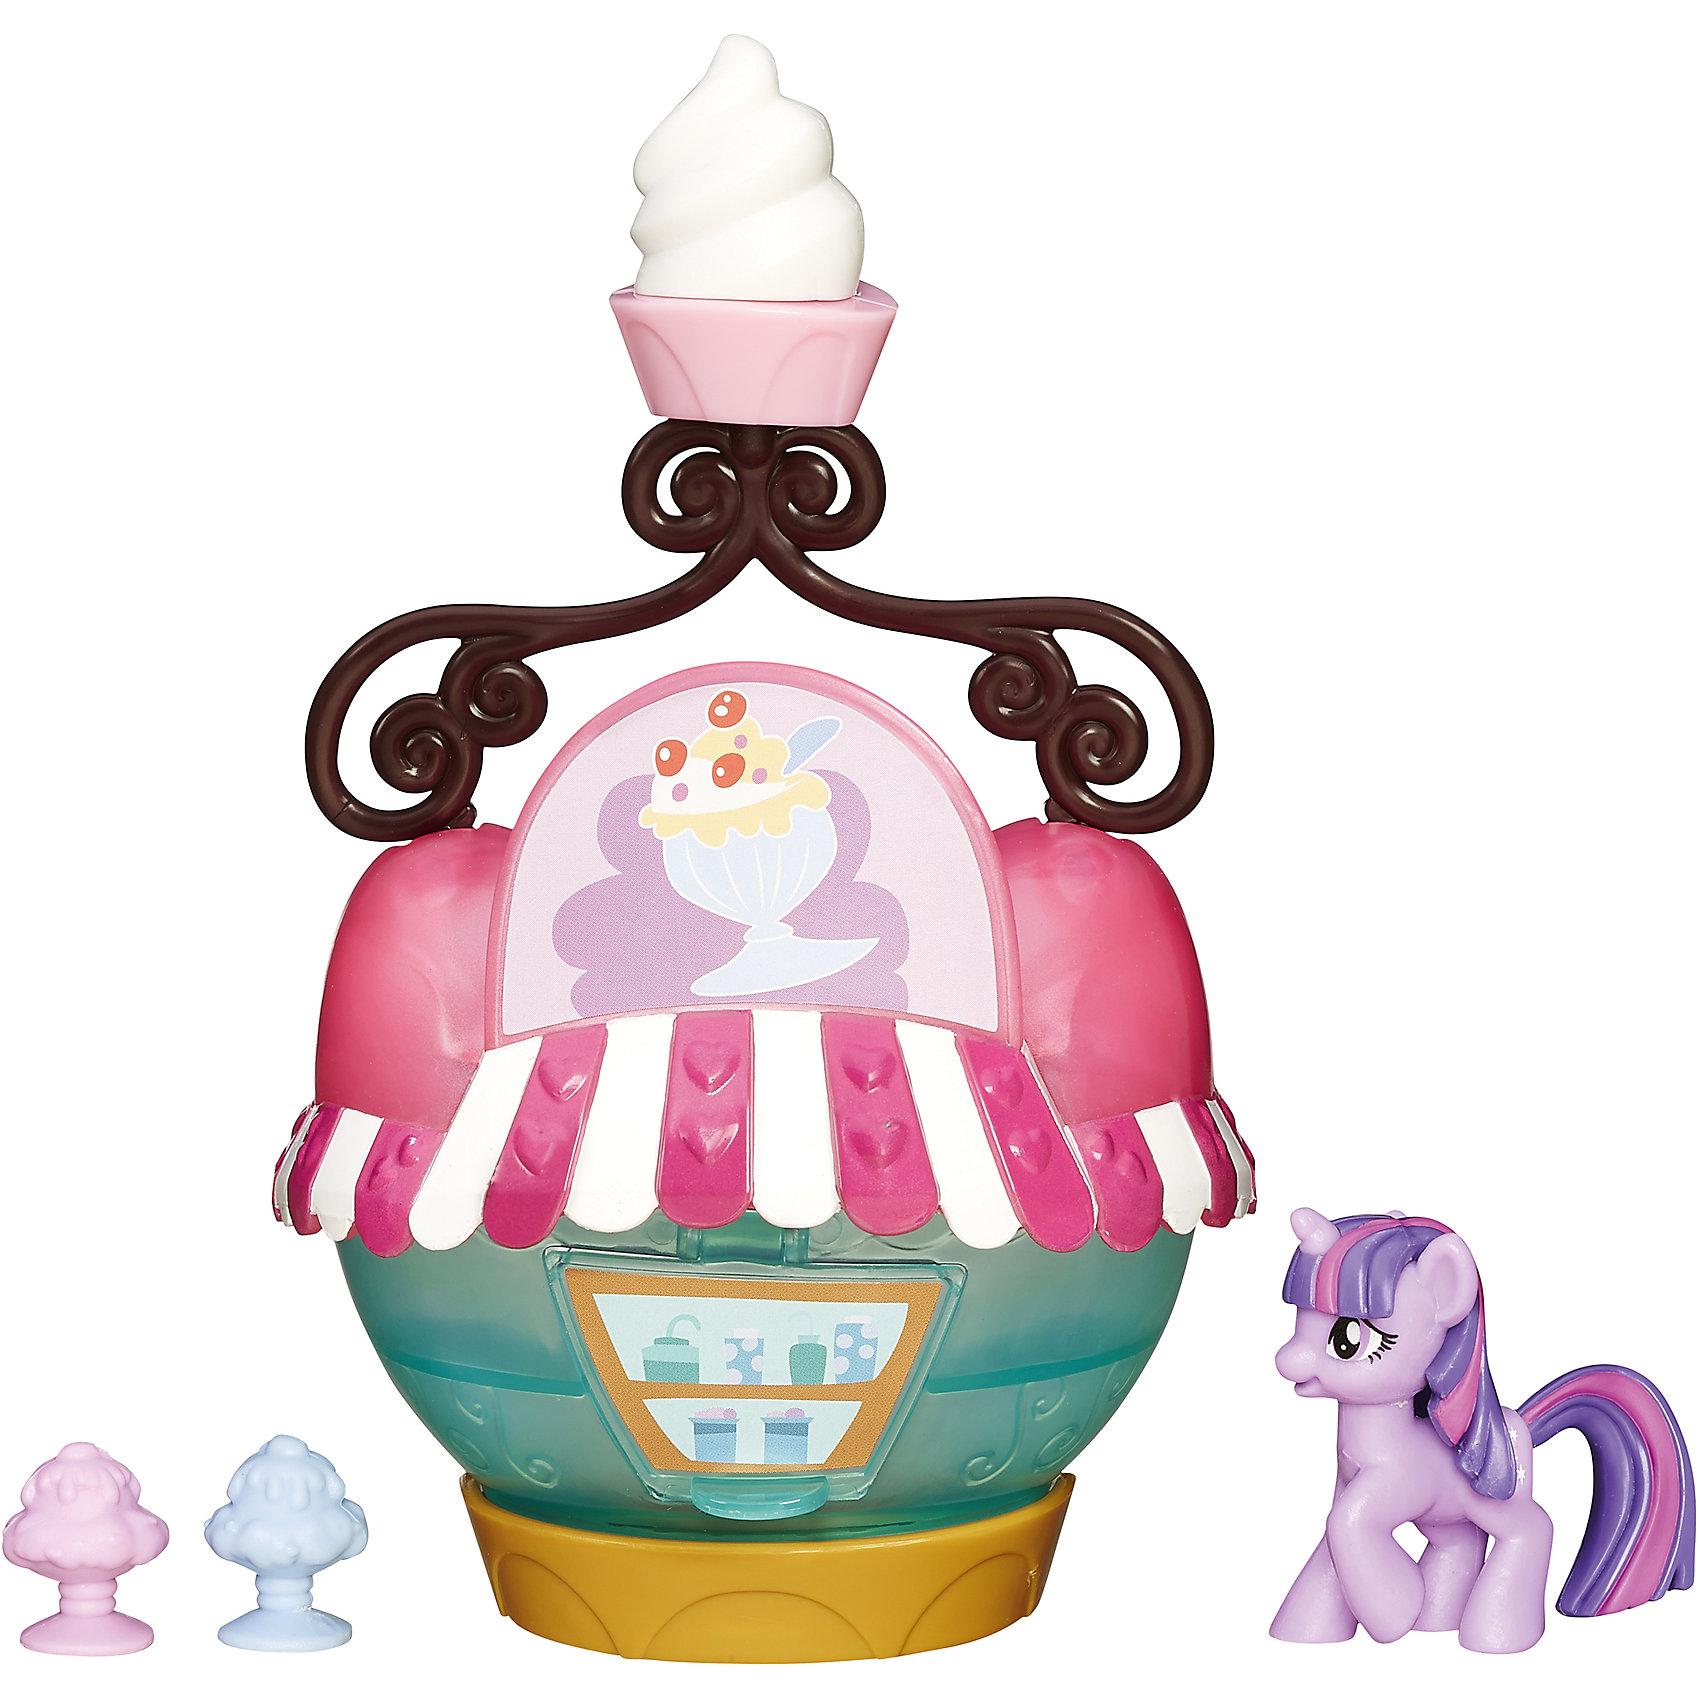 Hasbro Коллекционный игровой мини-набор пони Твайлайт Спаркл, My little Pony, B3597/B5568 мини фигурка my little pony твайлайт спаркл